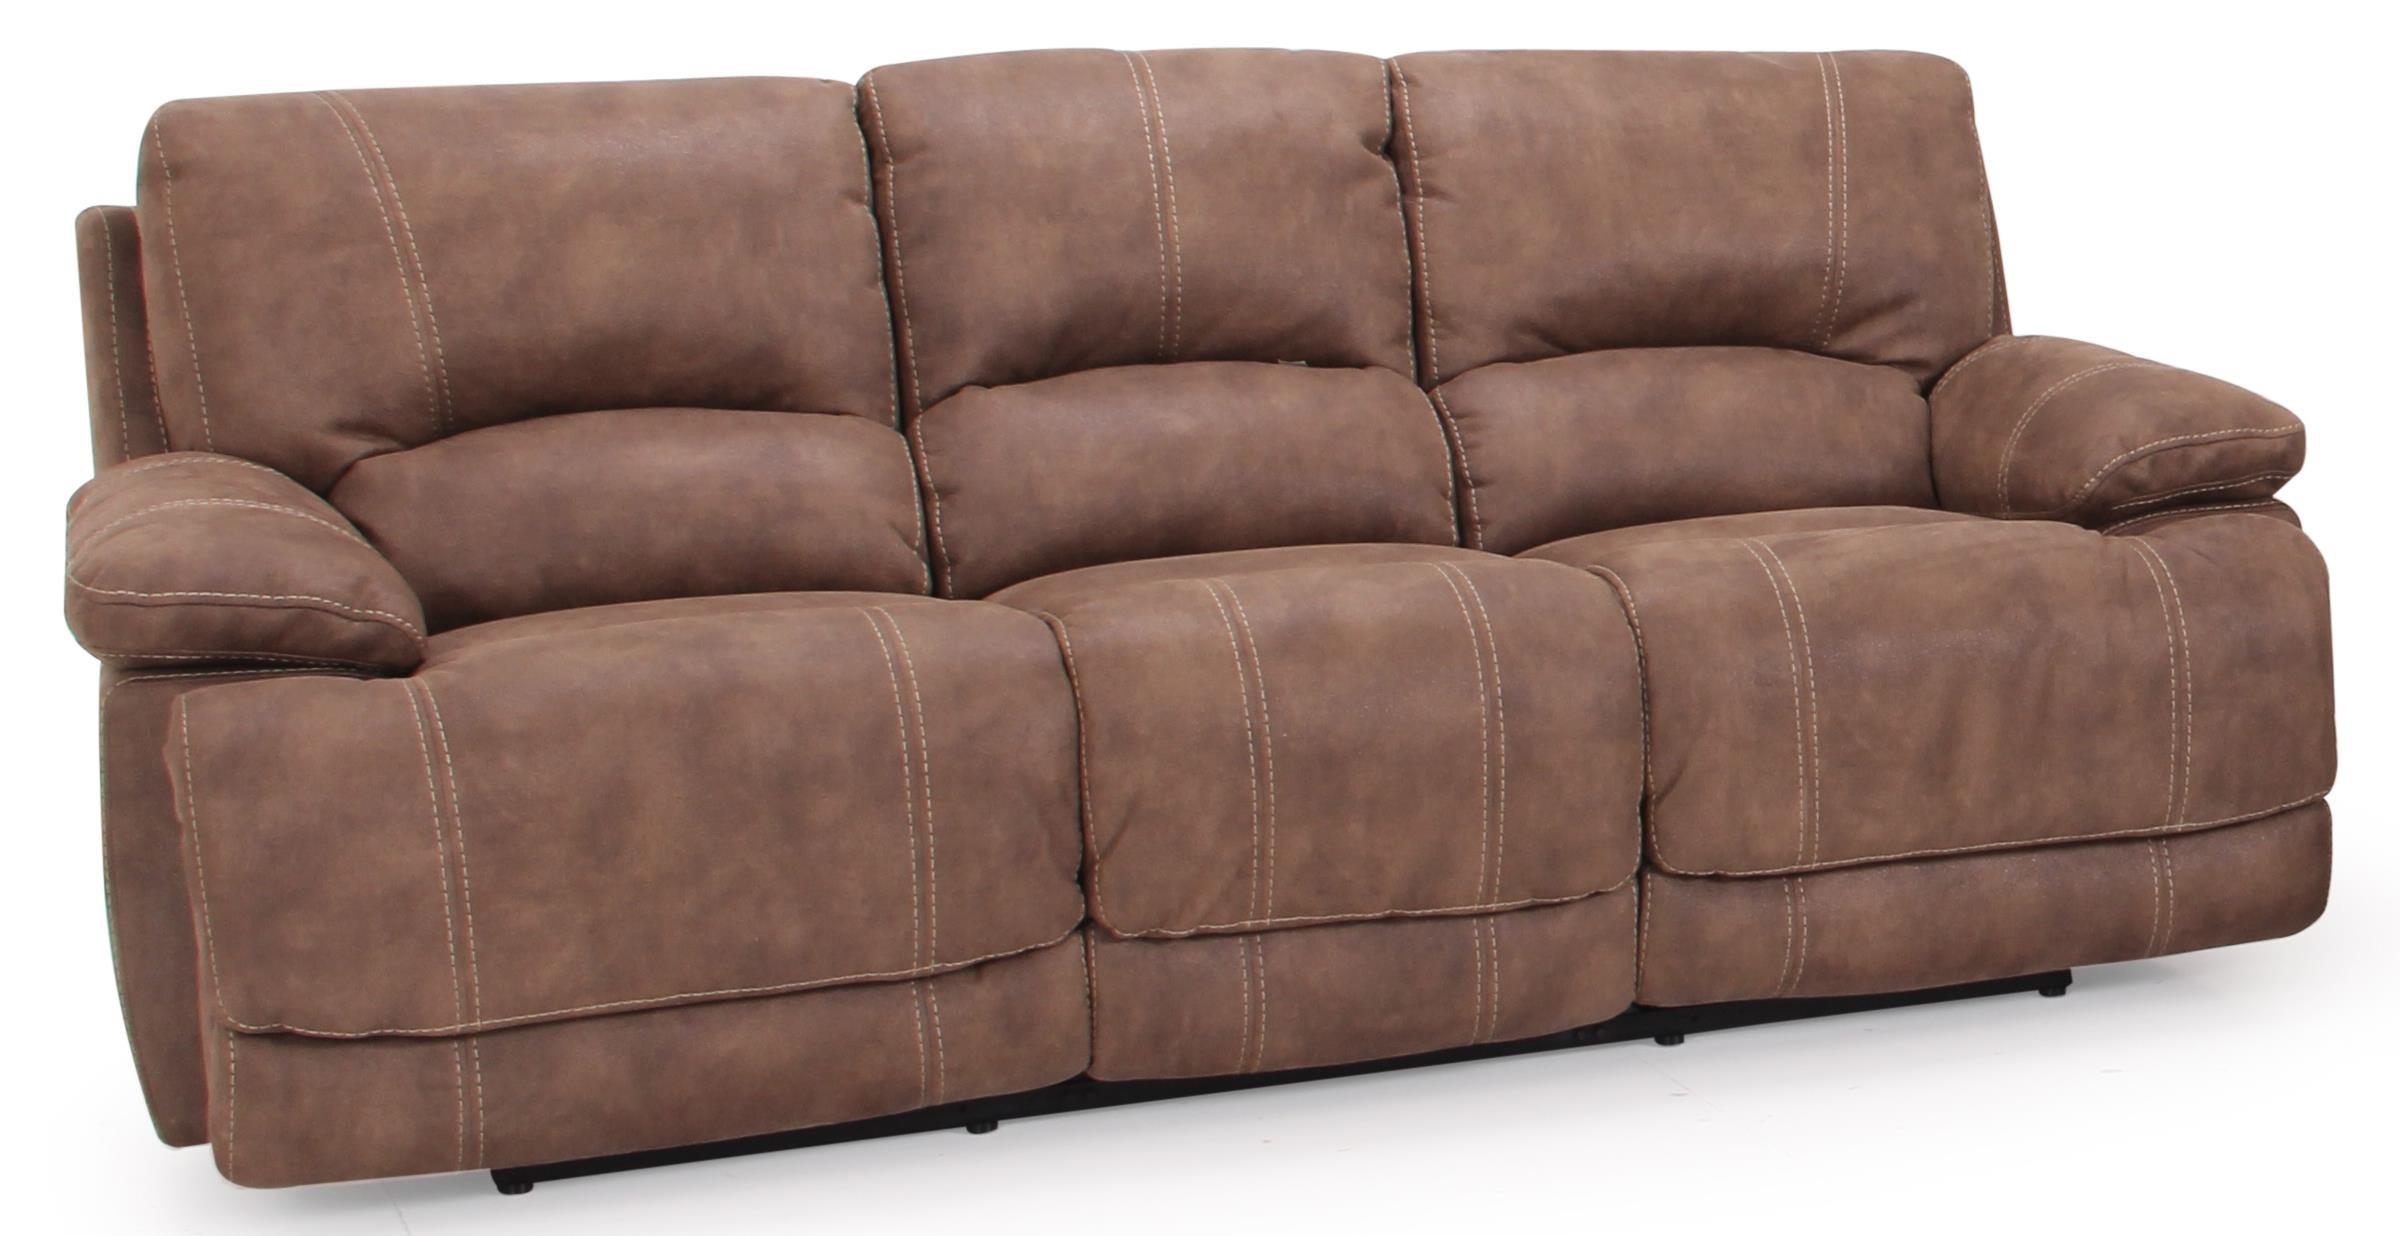 Cheers Sofa 8861m Manual Motion Reclining Sofa